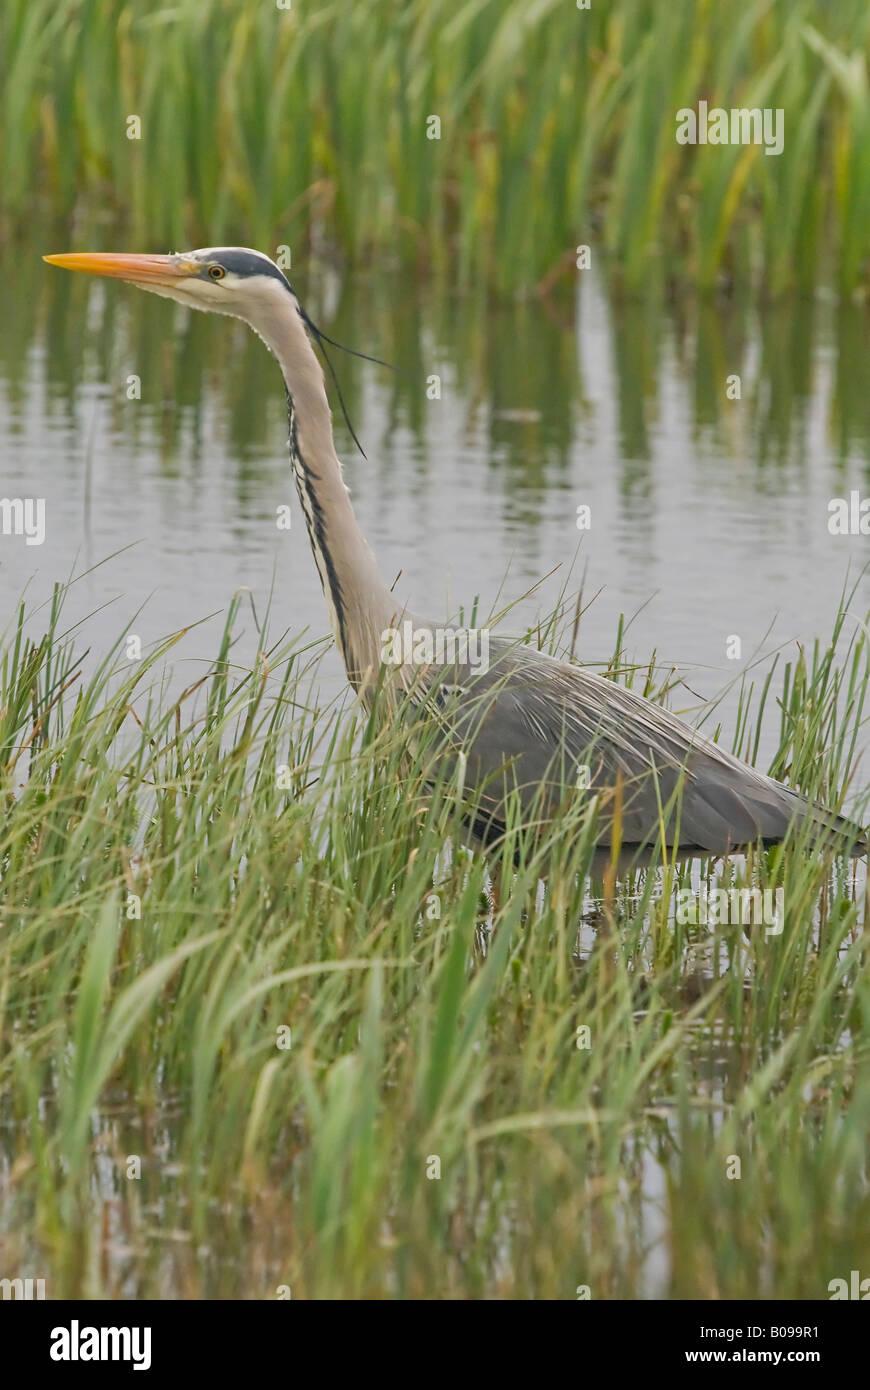 Grey Heron Ardea cinerea fishing piscivore bird - Stock Image